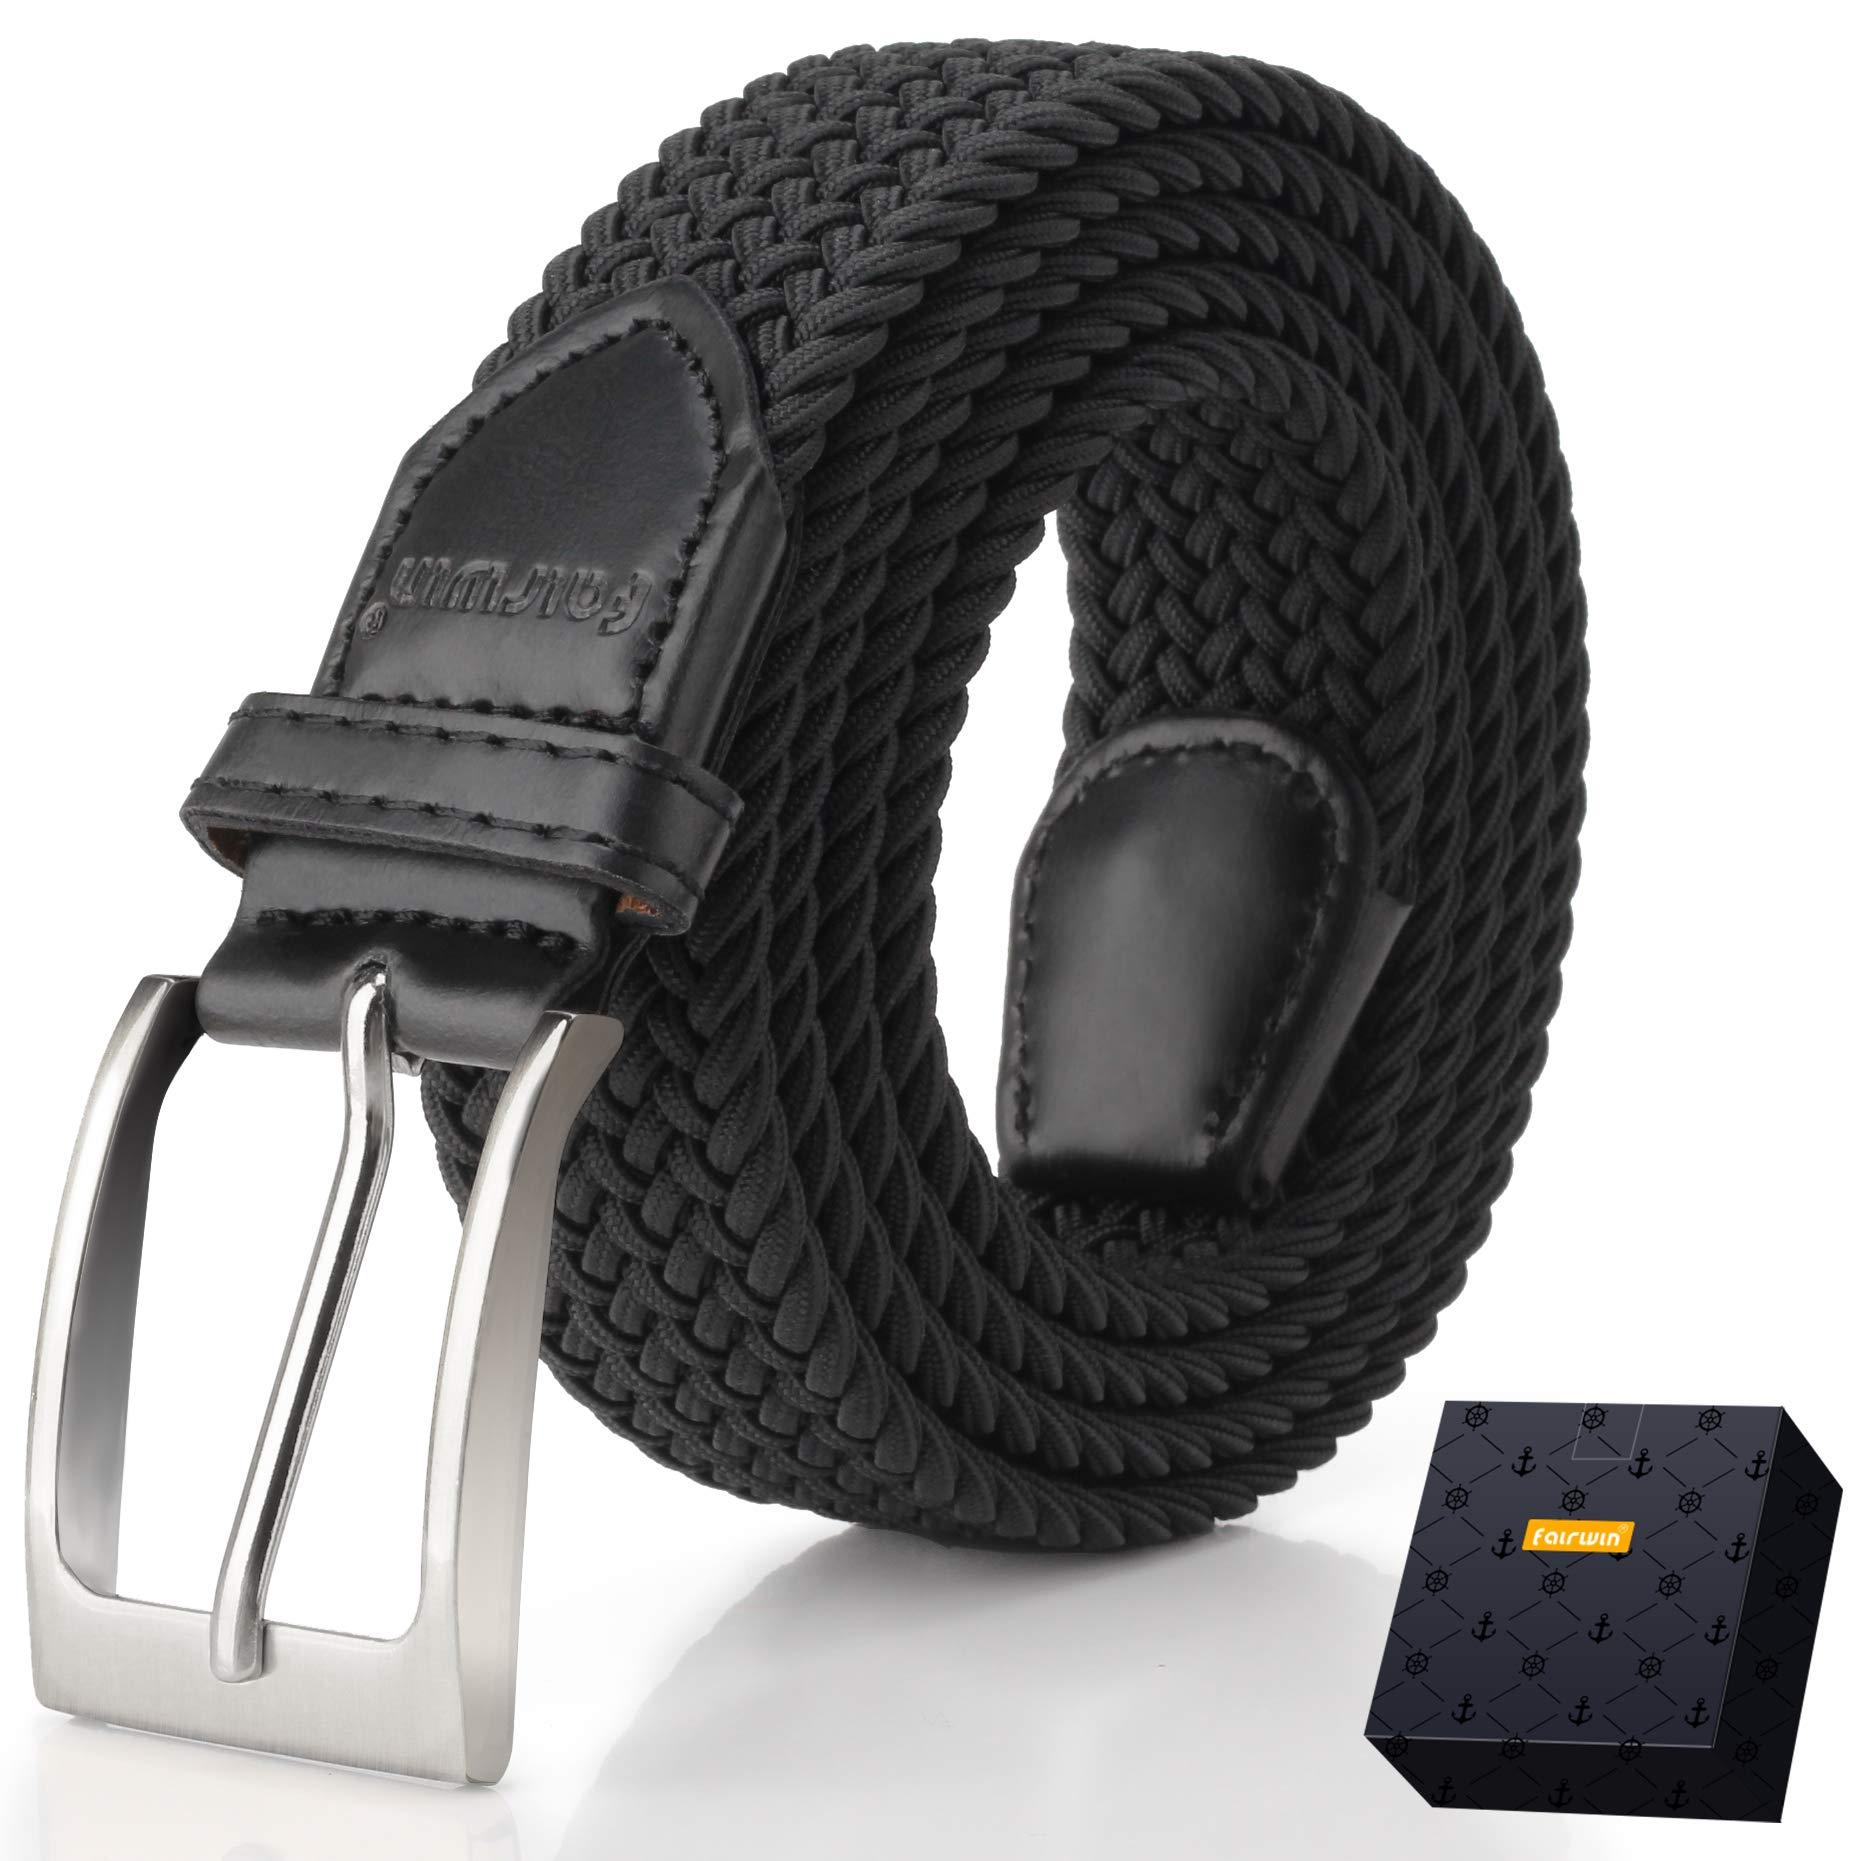 2b9cf7629 Elastic Braided Belt, Fairwin Enduring Stretch Woven Belt for Men/Women/Junior  product